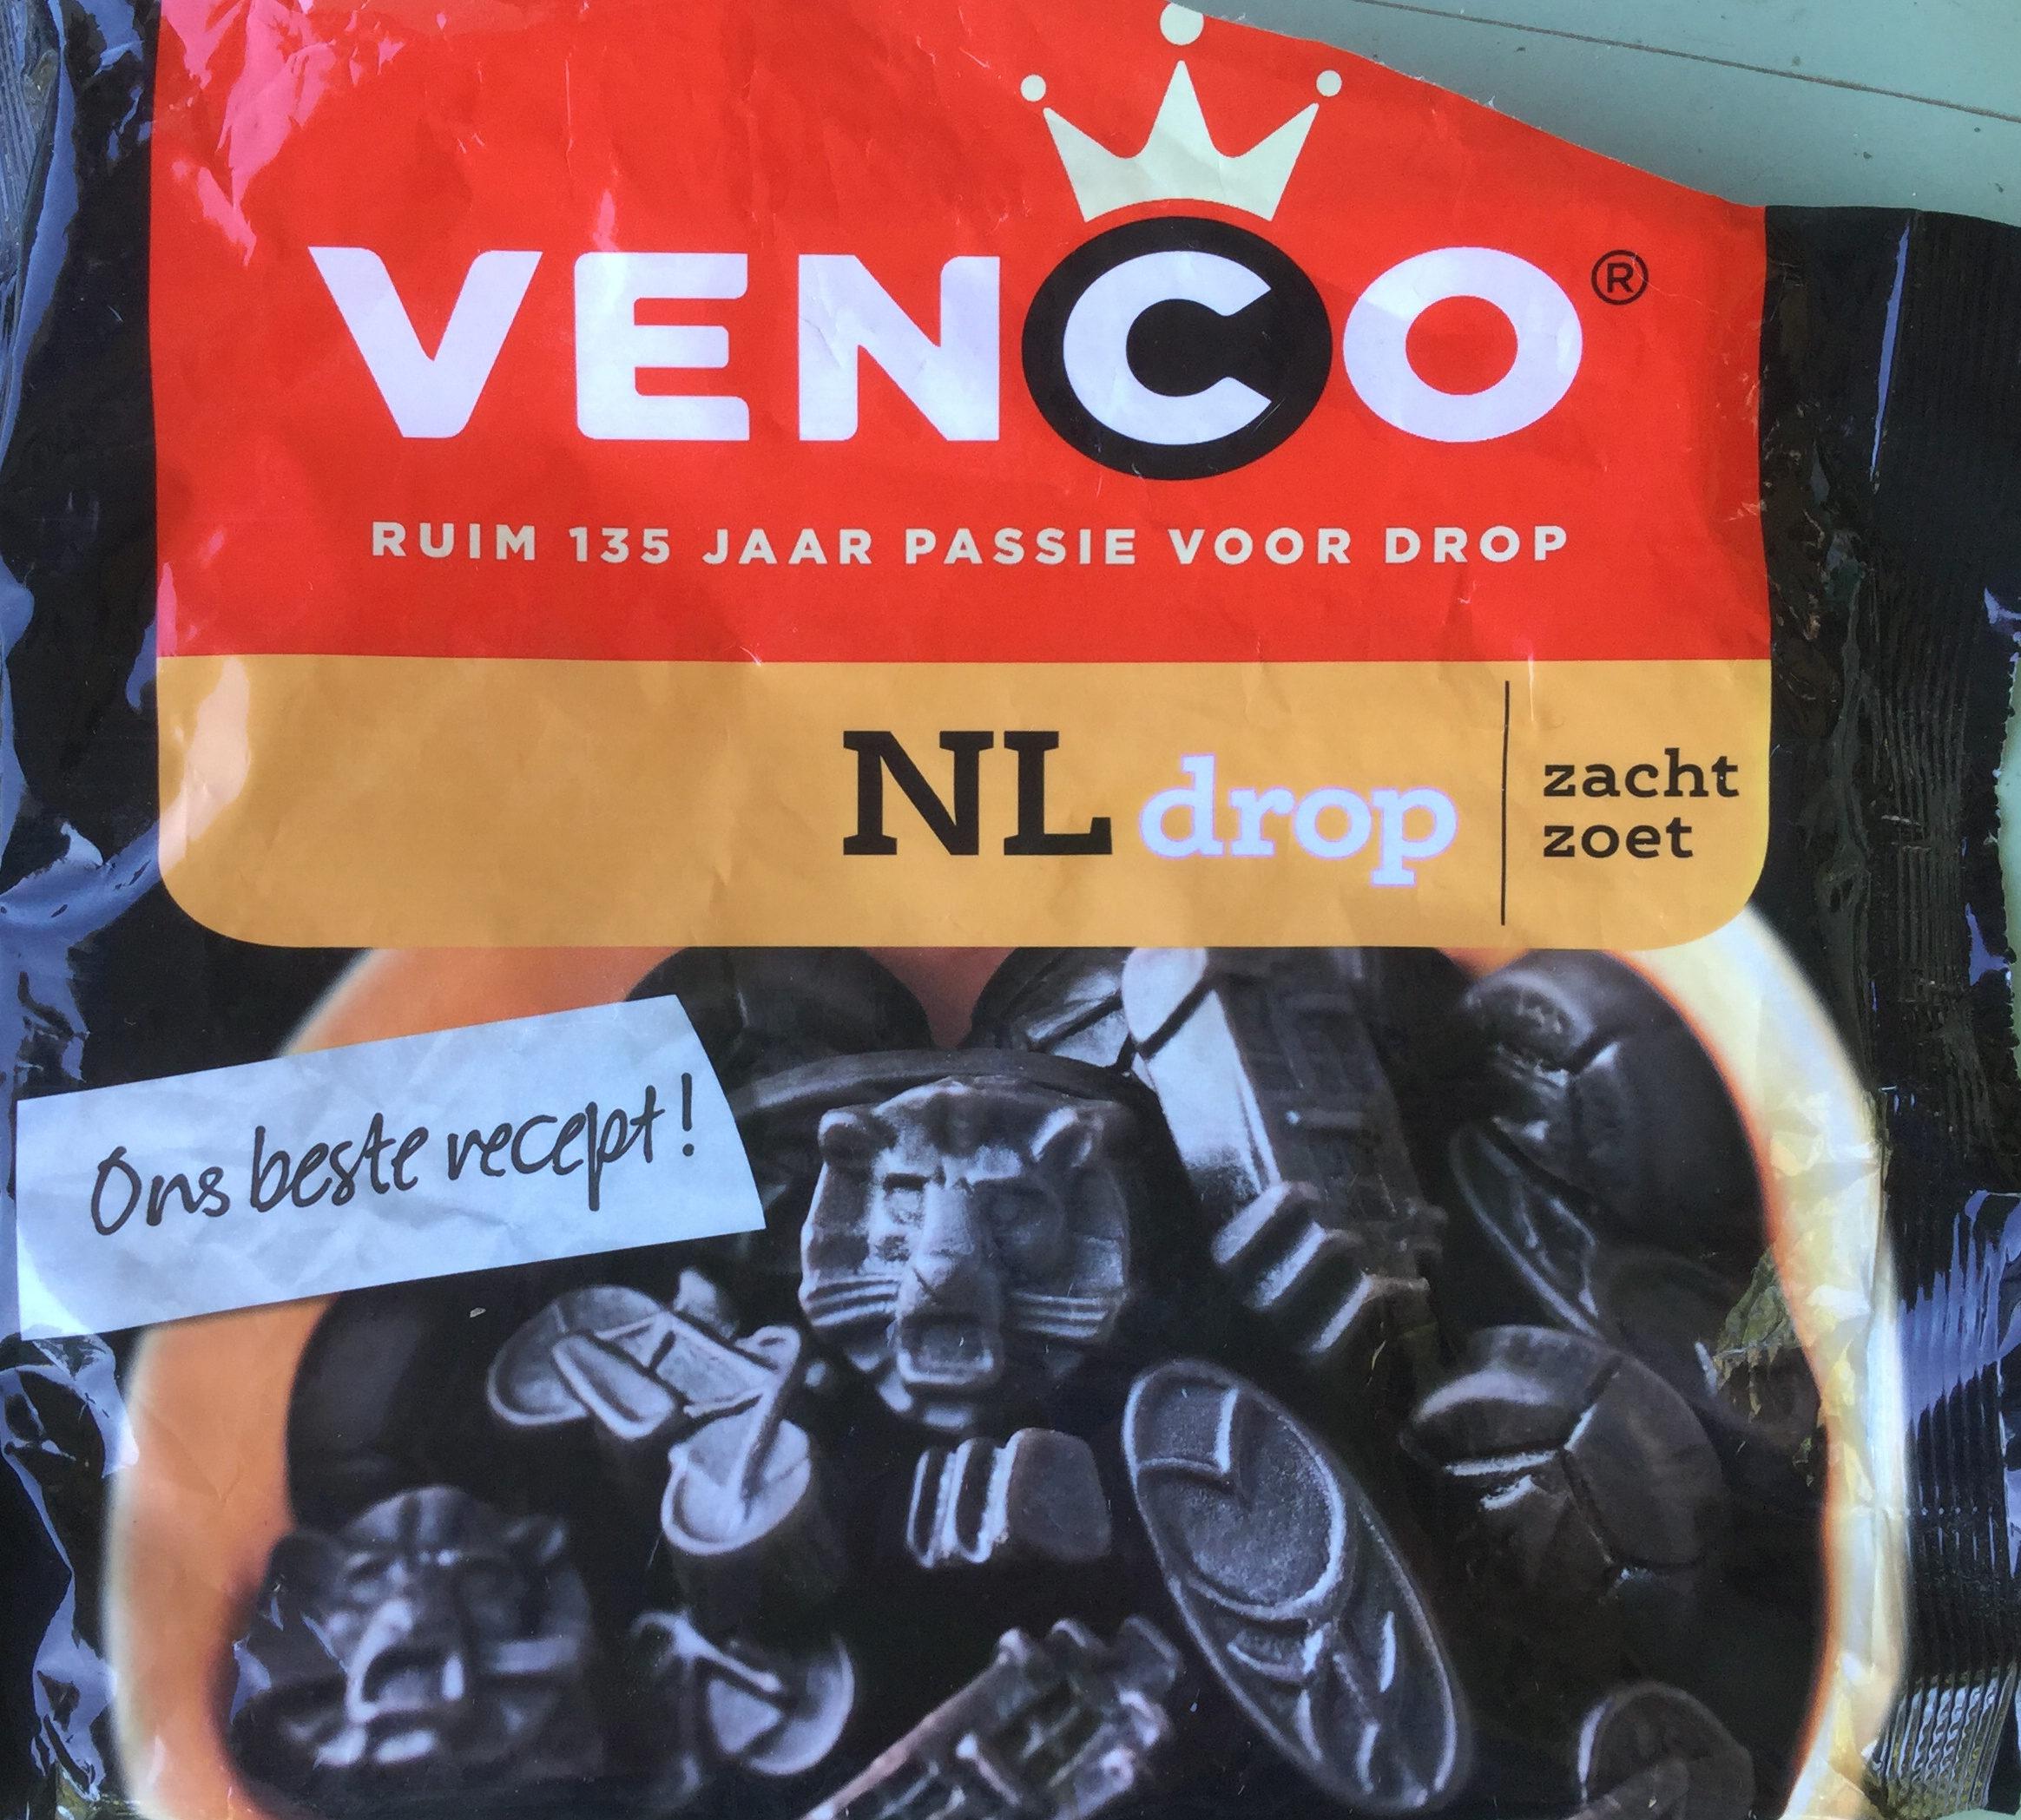 NL drop zacht zoet - Product